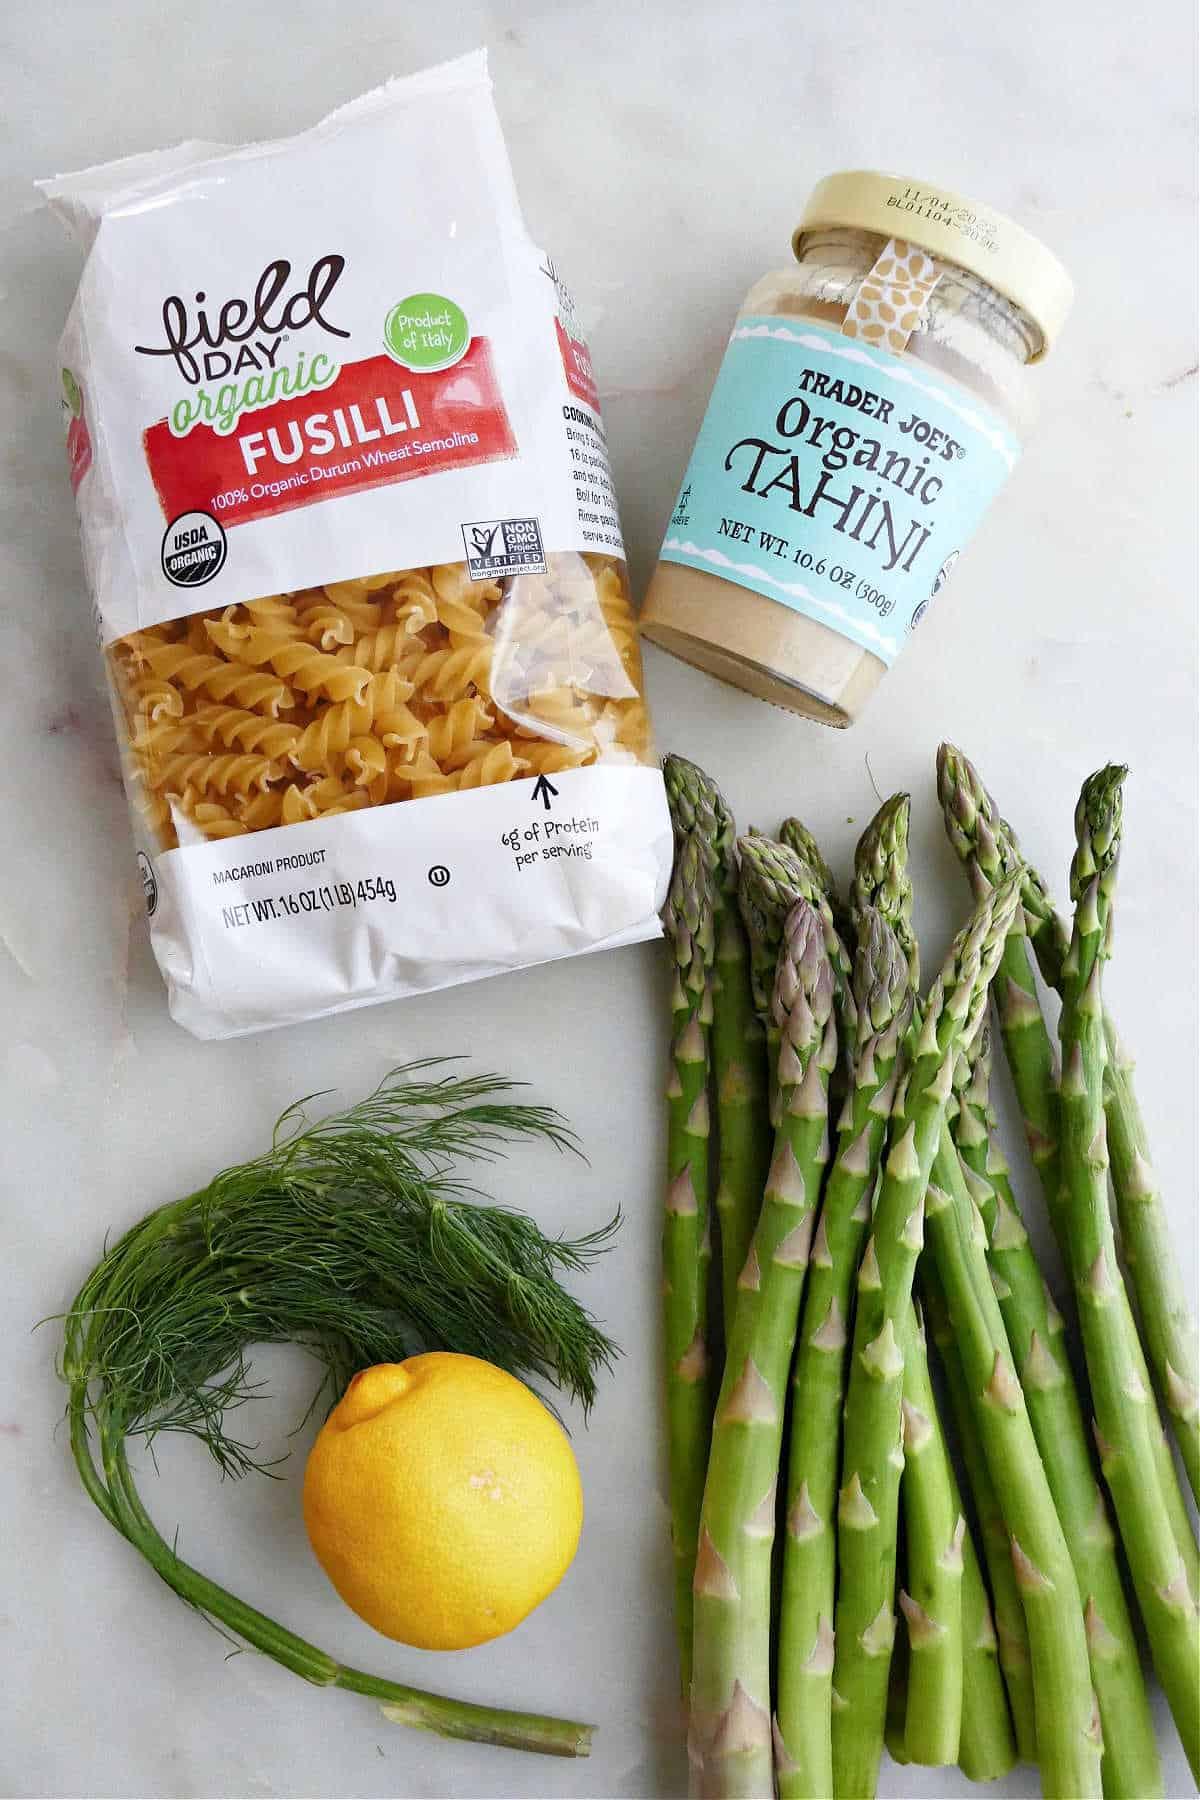 bag of fusilli pasta next to tahini jar, dill, lemon, and asparagus